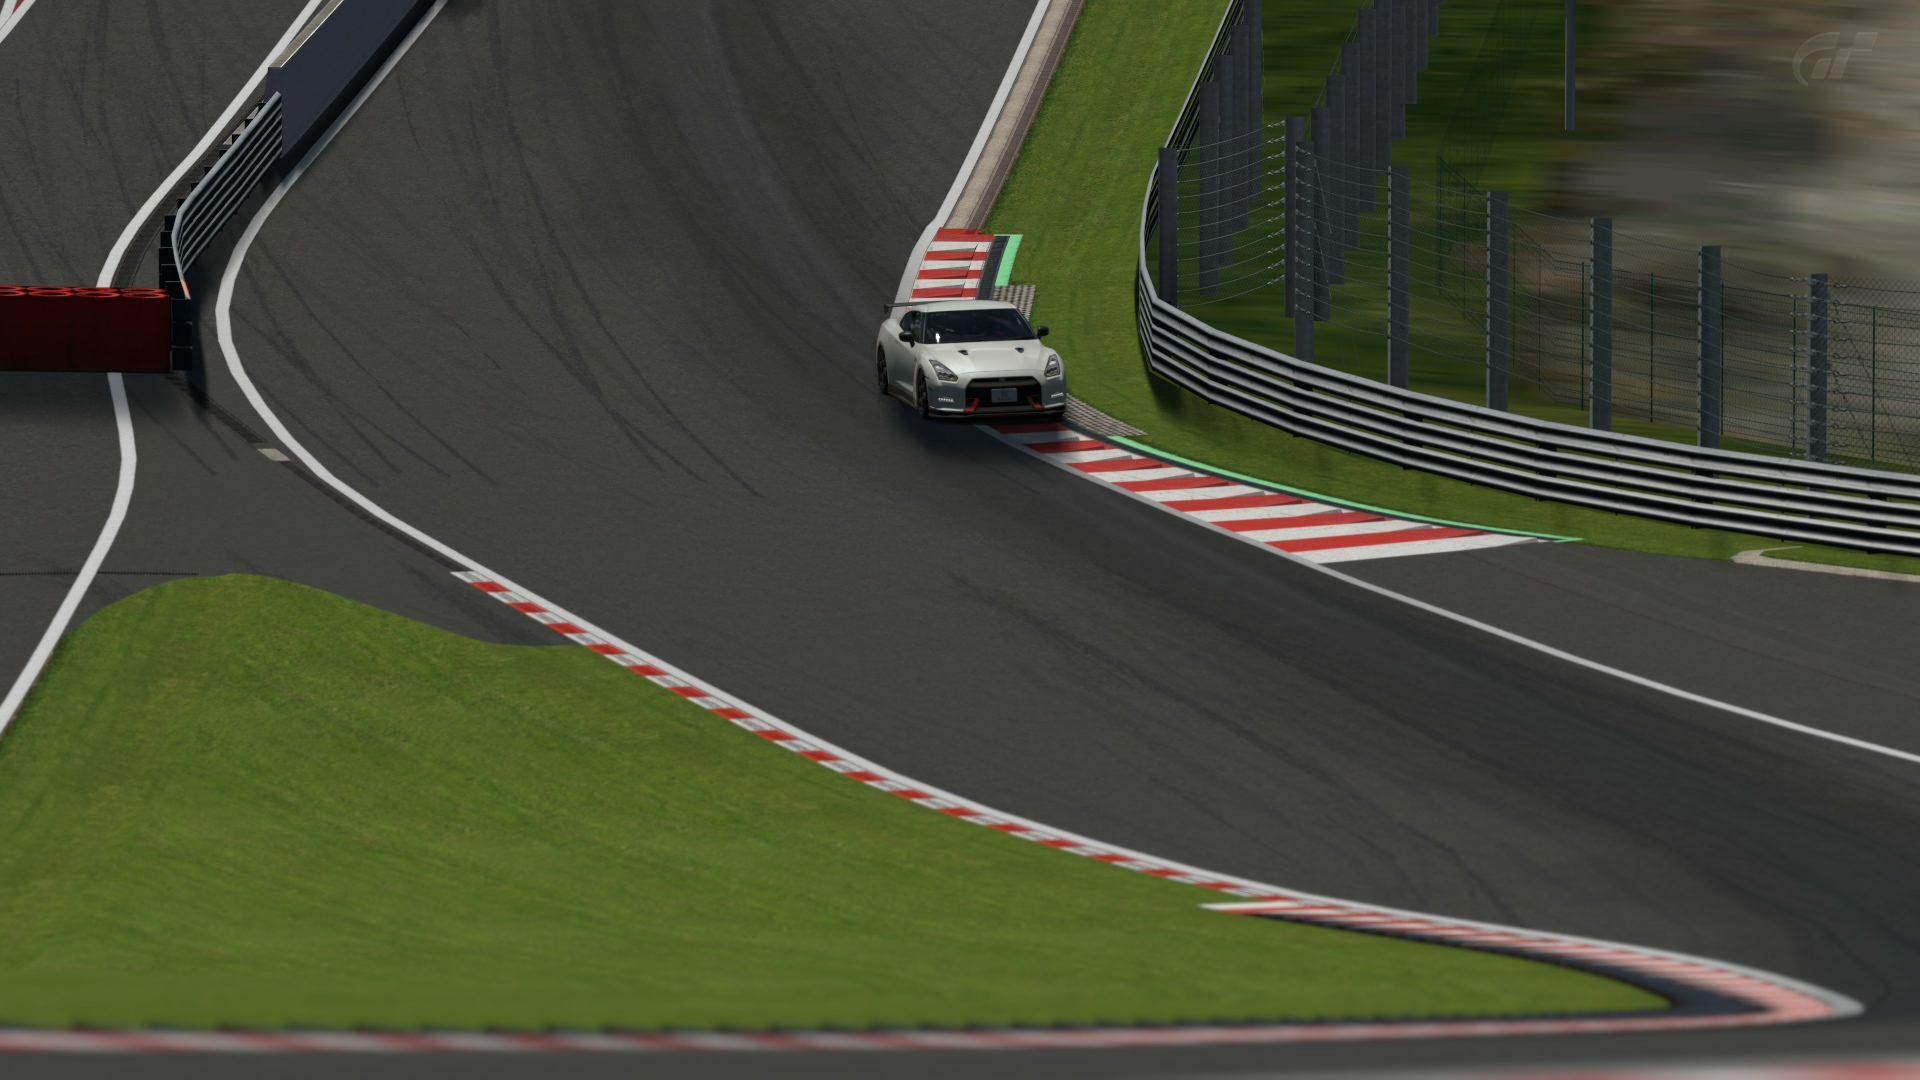 Circuit de Spa-Francorchamps (2).jpg